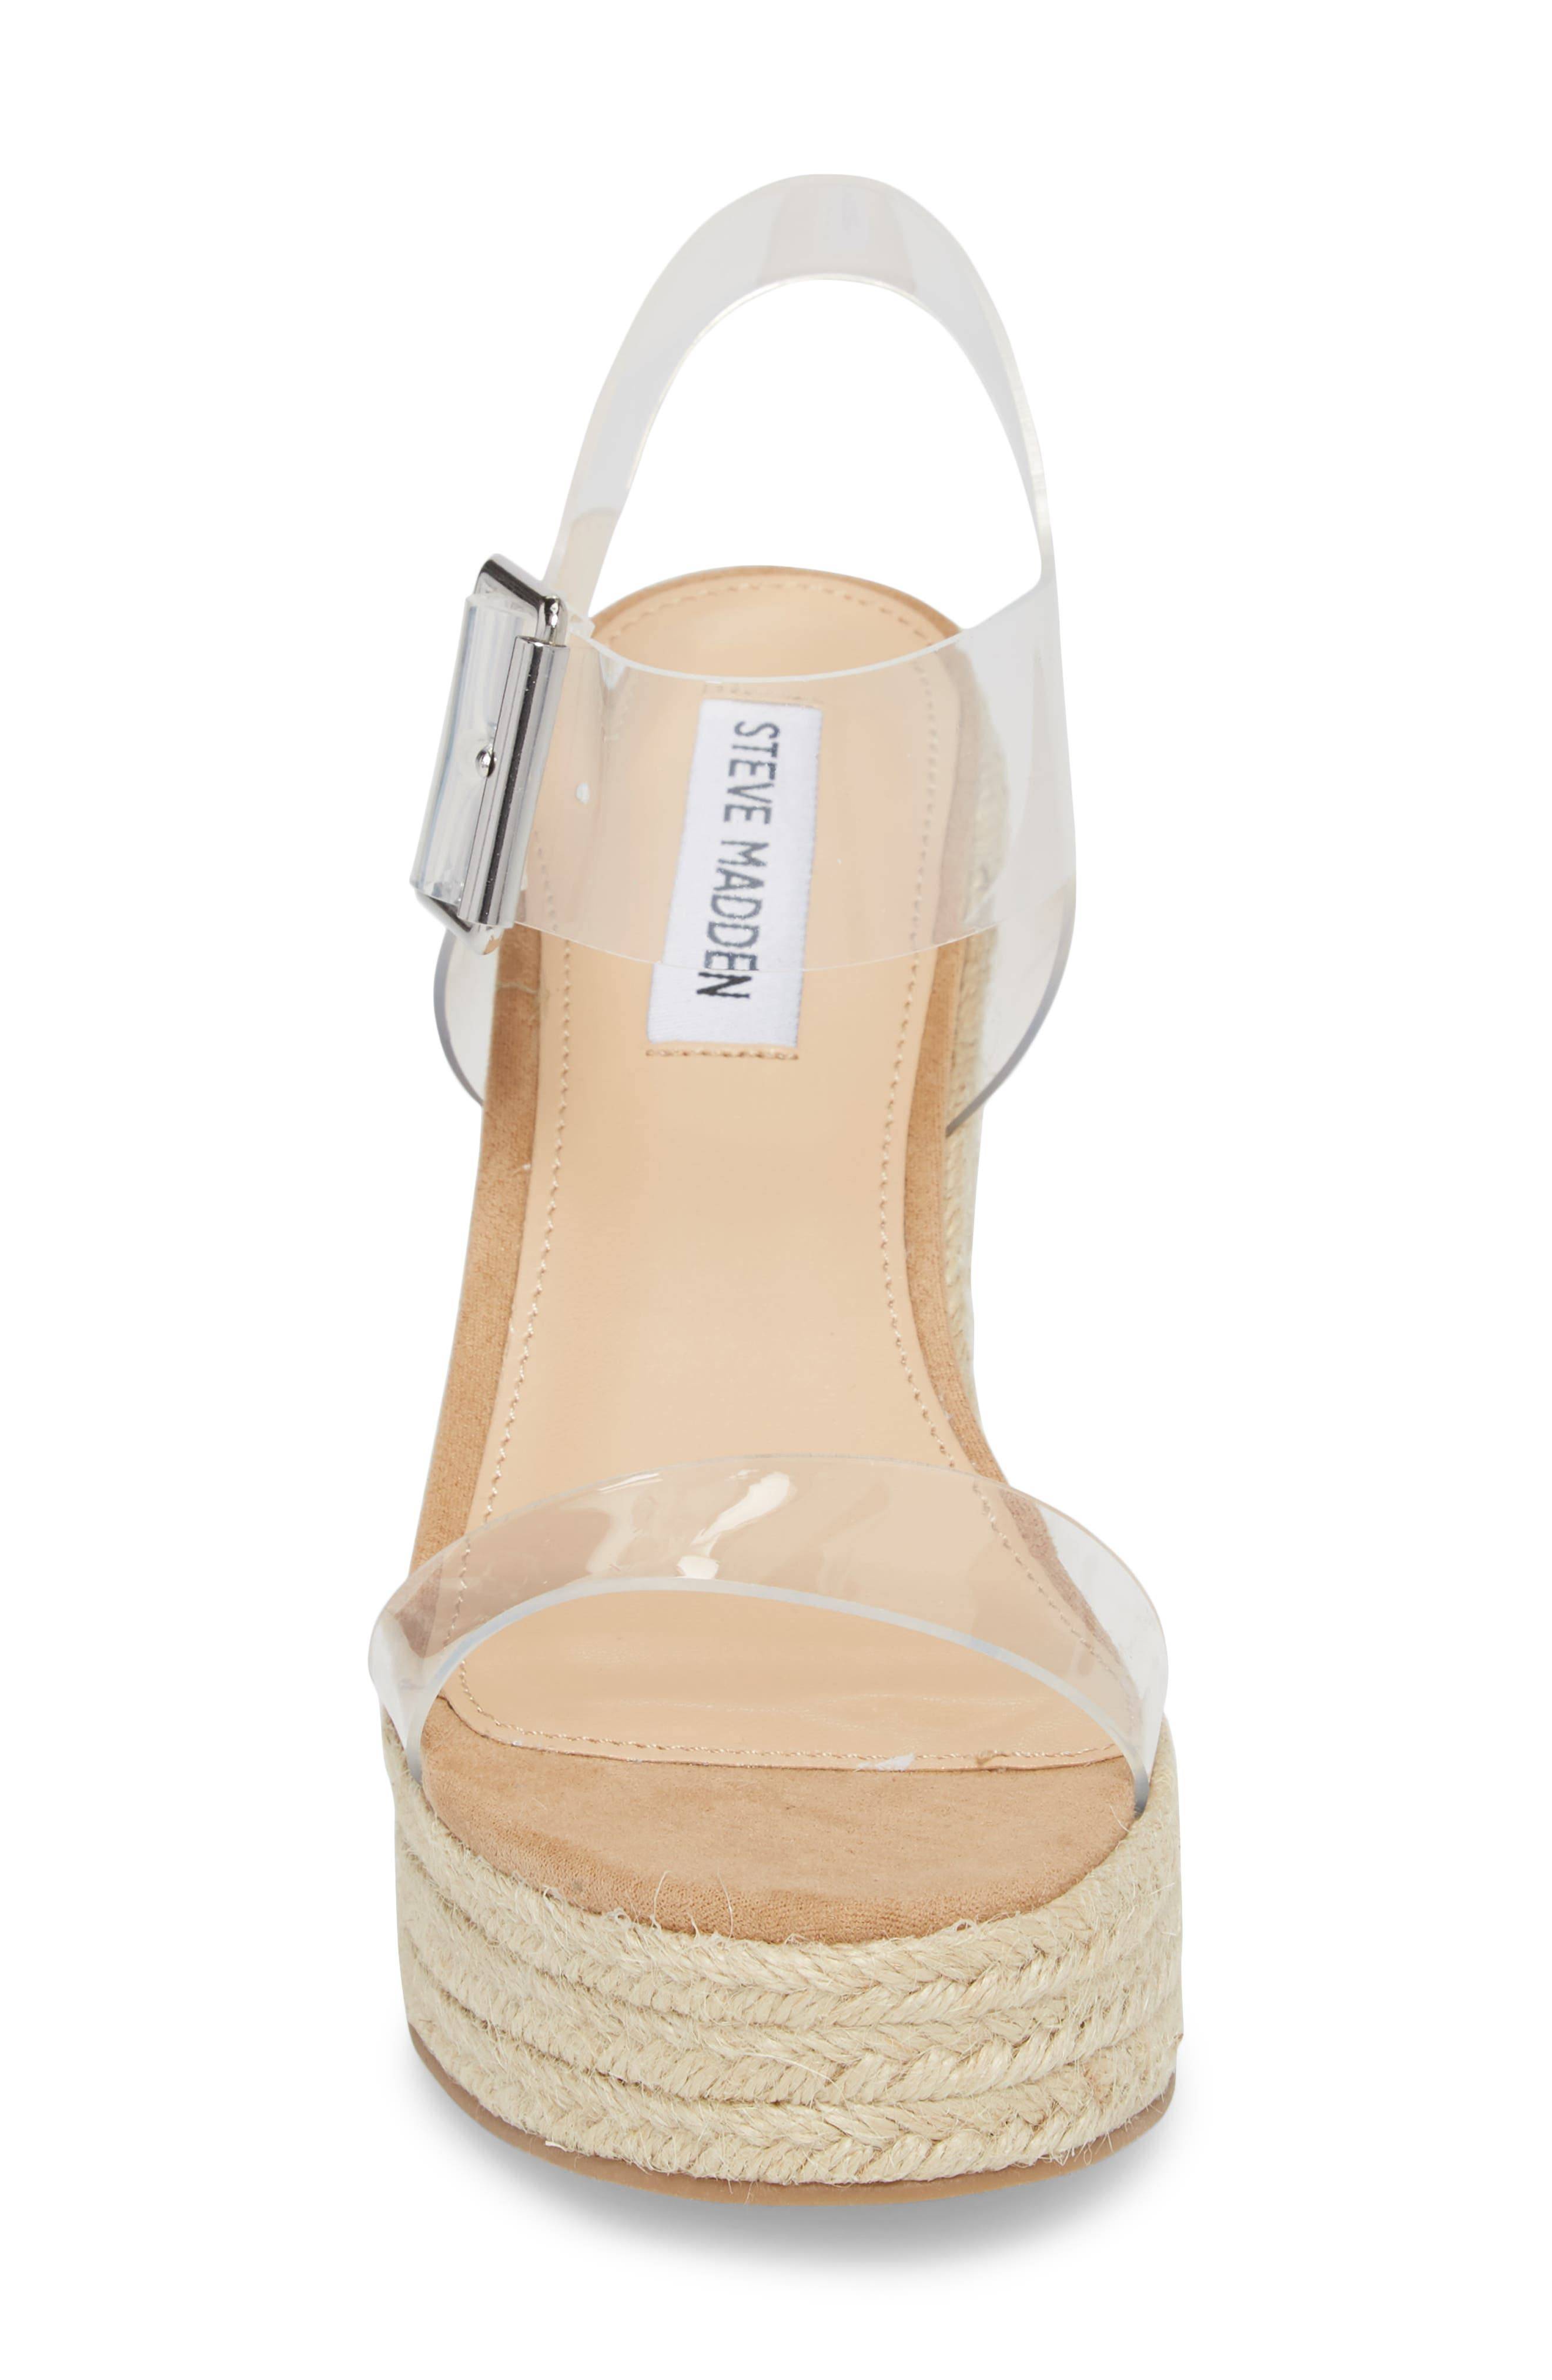 Splash Transparent Strap Wedge Sandal,                             Alternate thumbnail 4, color,                             250